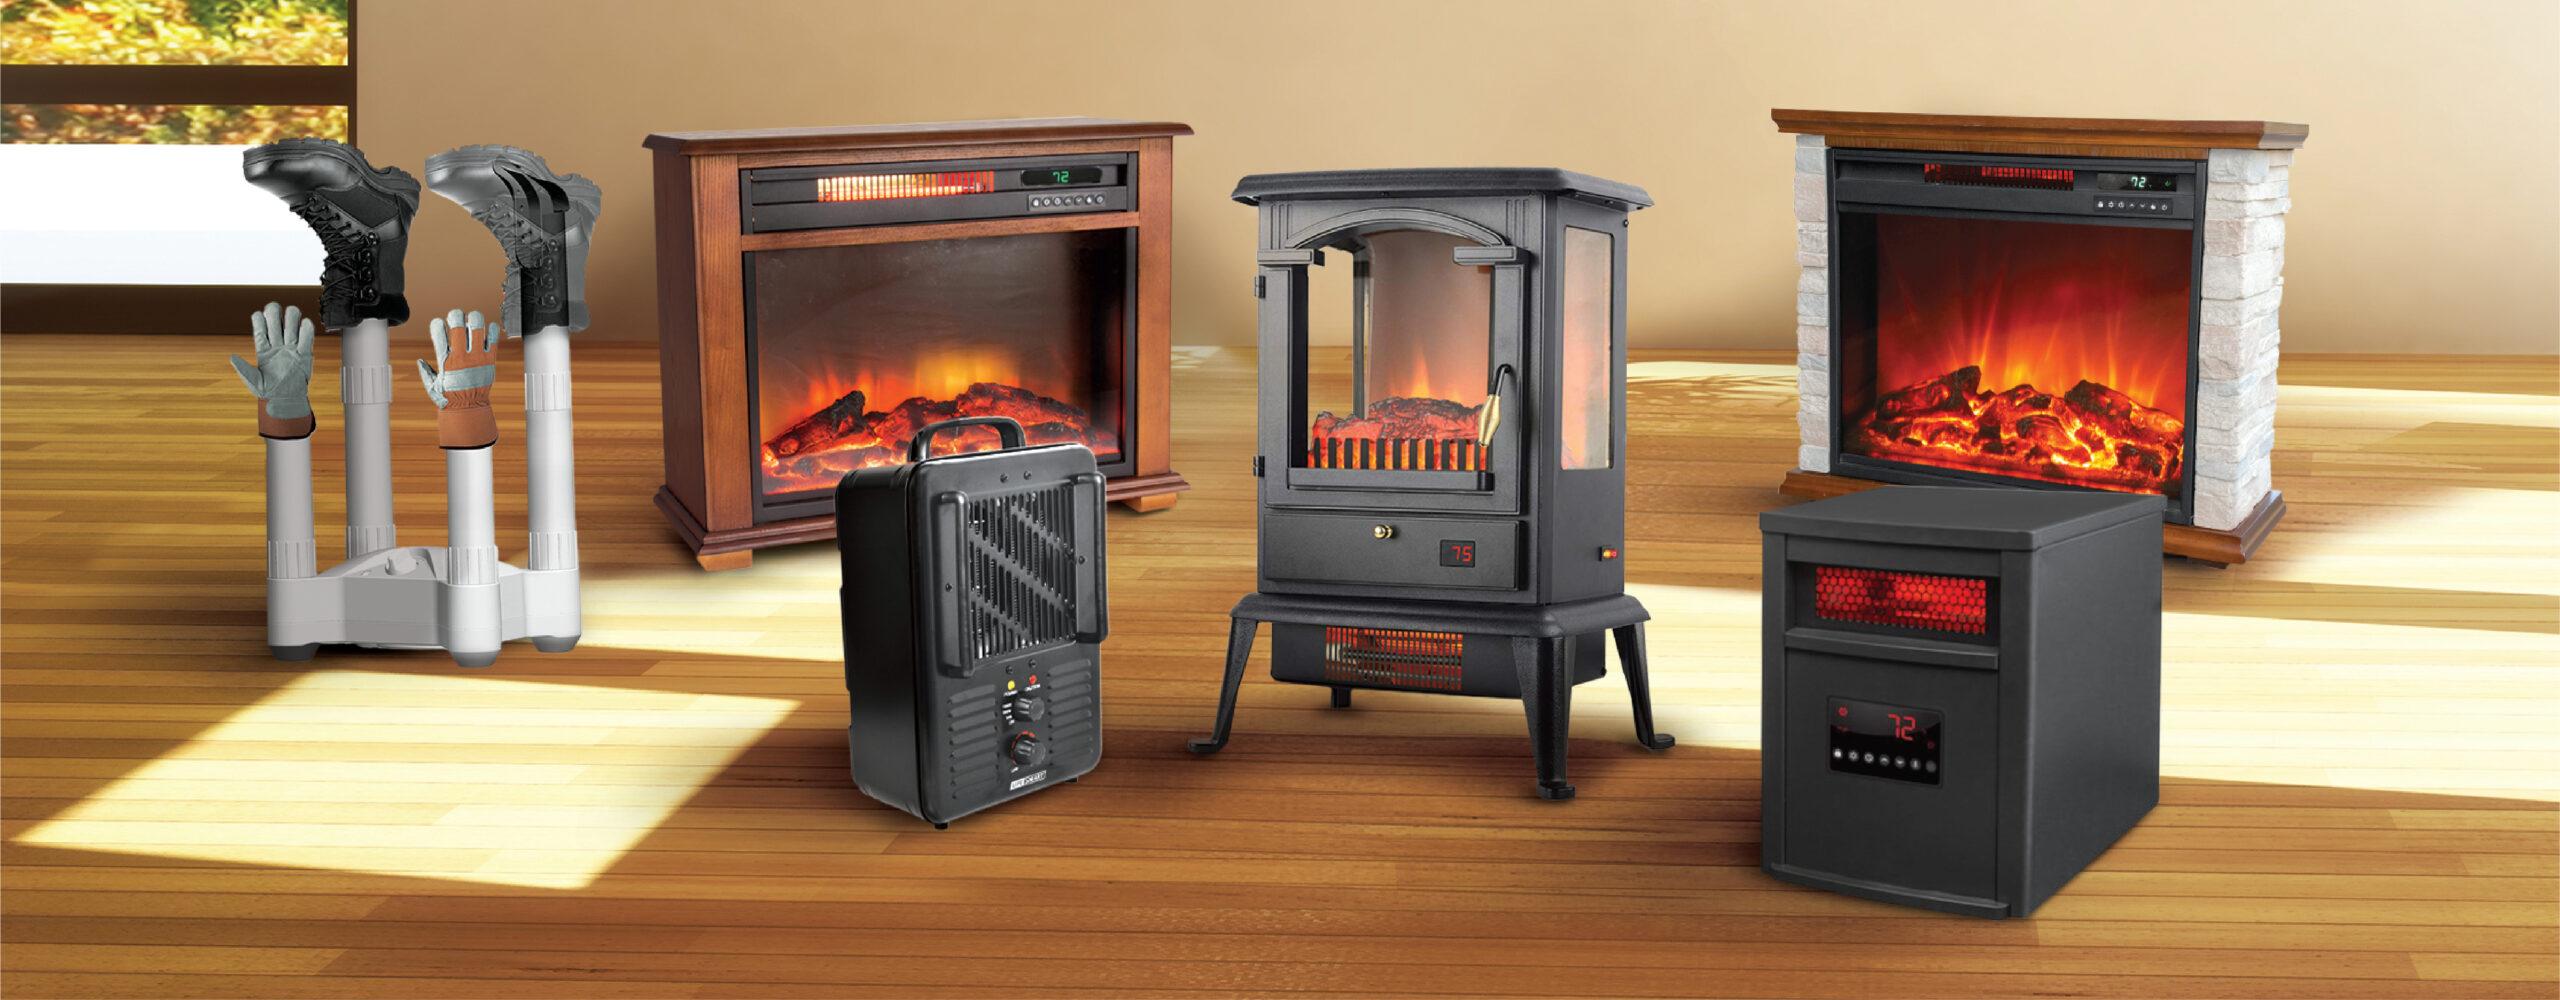 20-1264-Mike-Dolder-Lifesmart-product-graphics_heaters